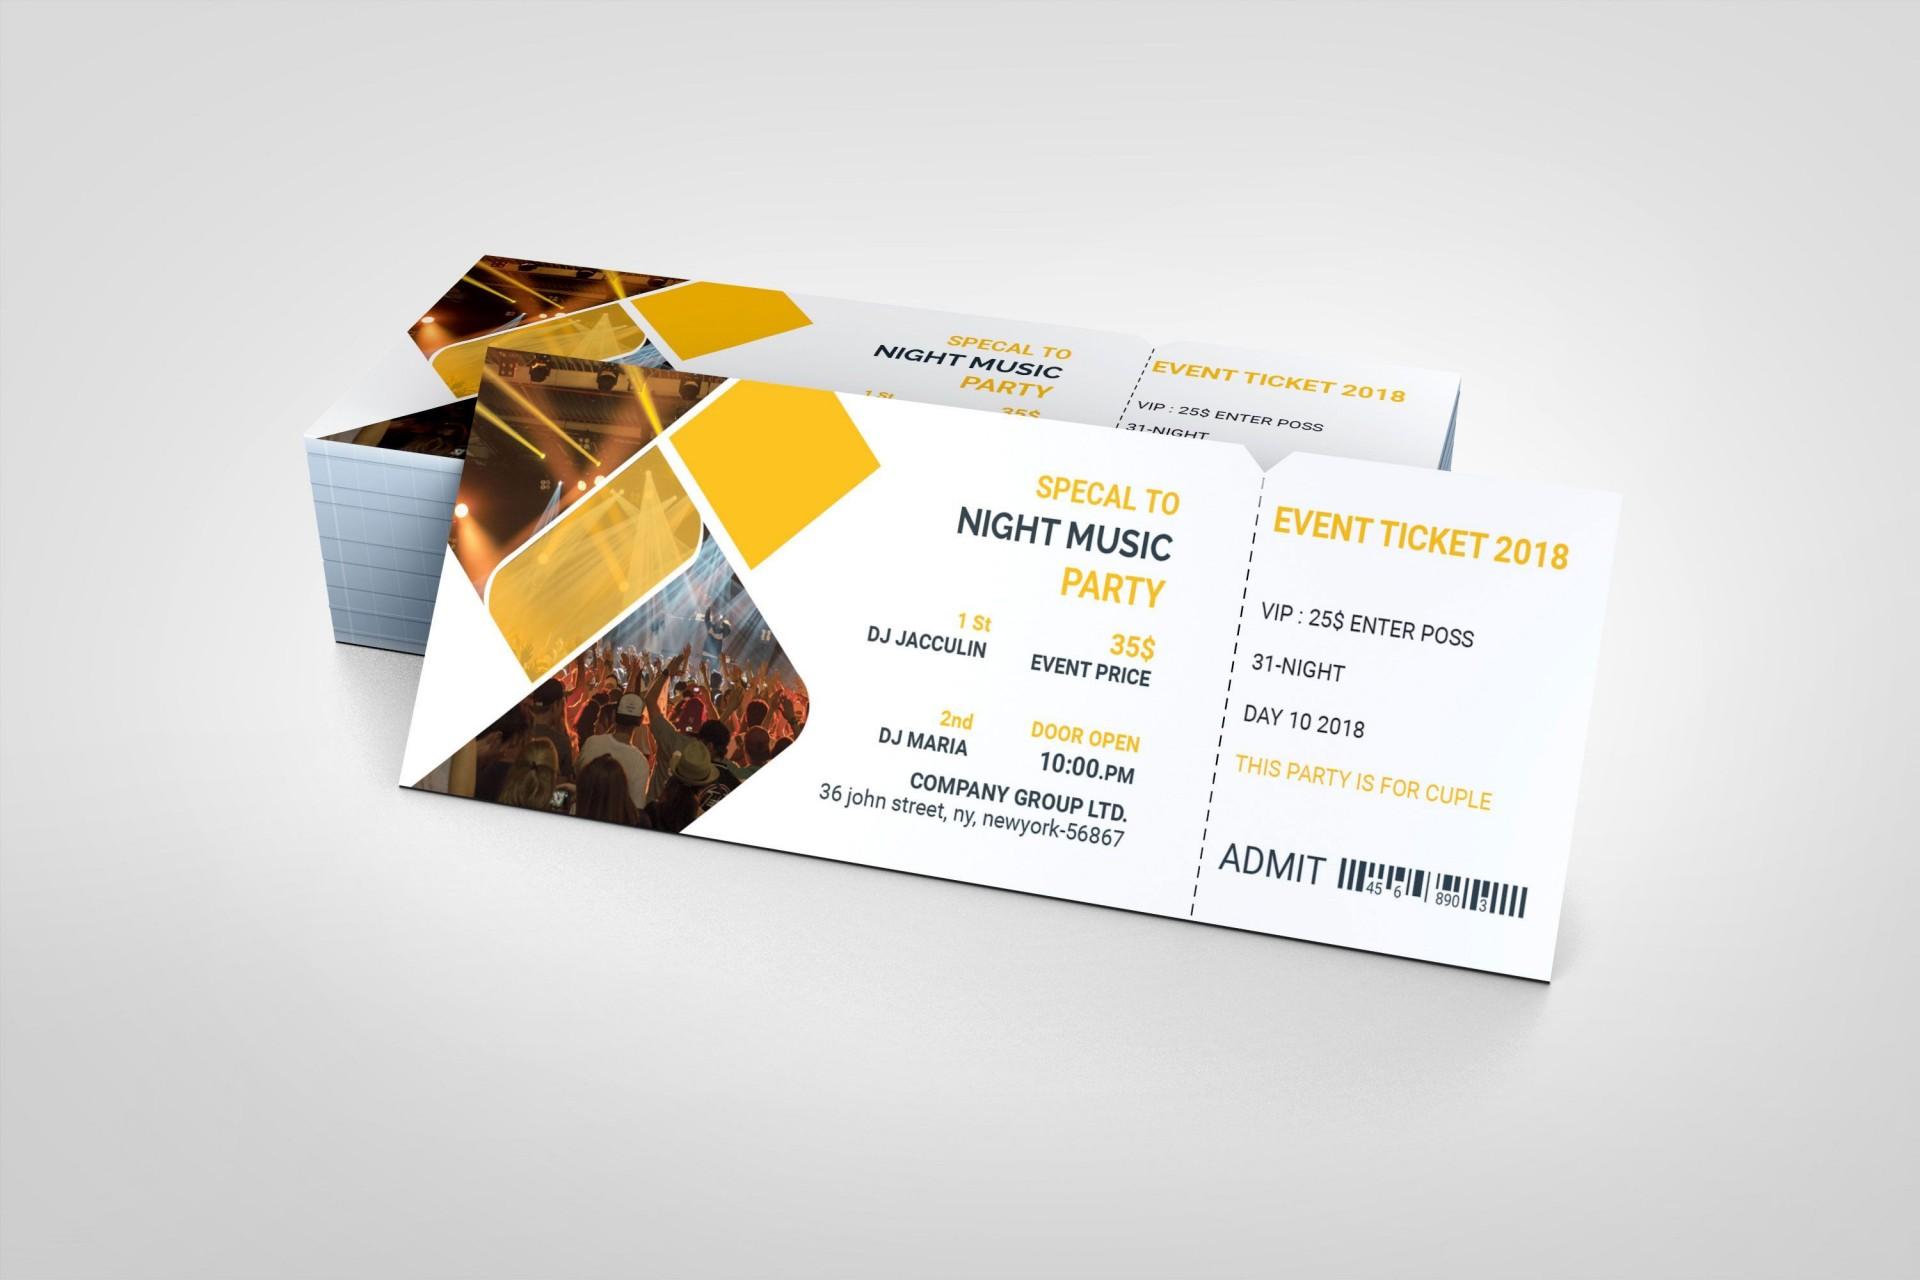 001 Impressive Event Ticket Template Photoshop Image  Design Psd Free Download1920